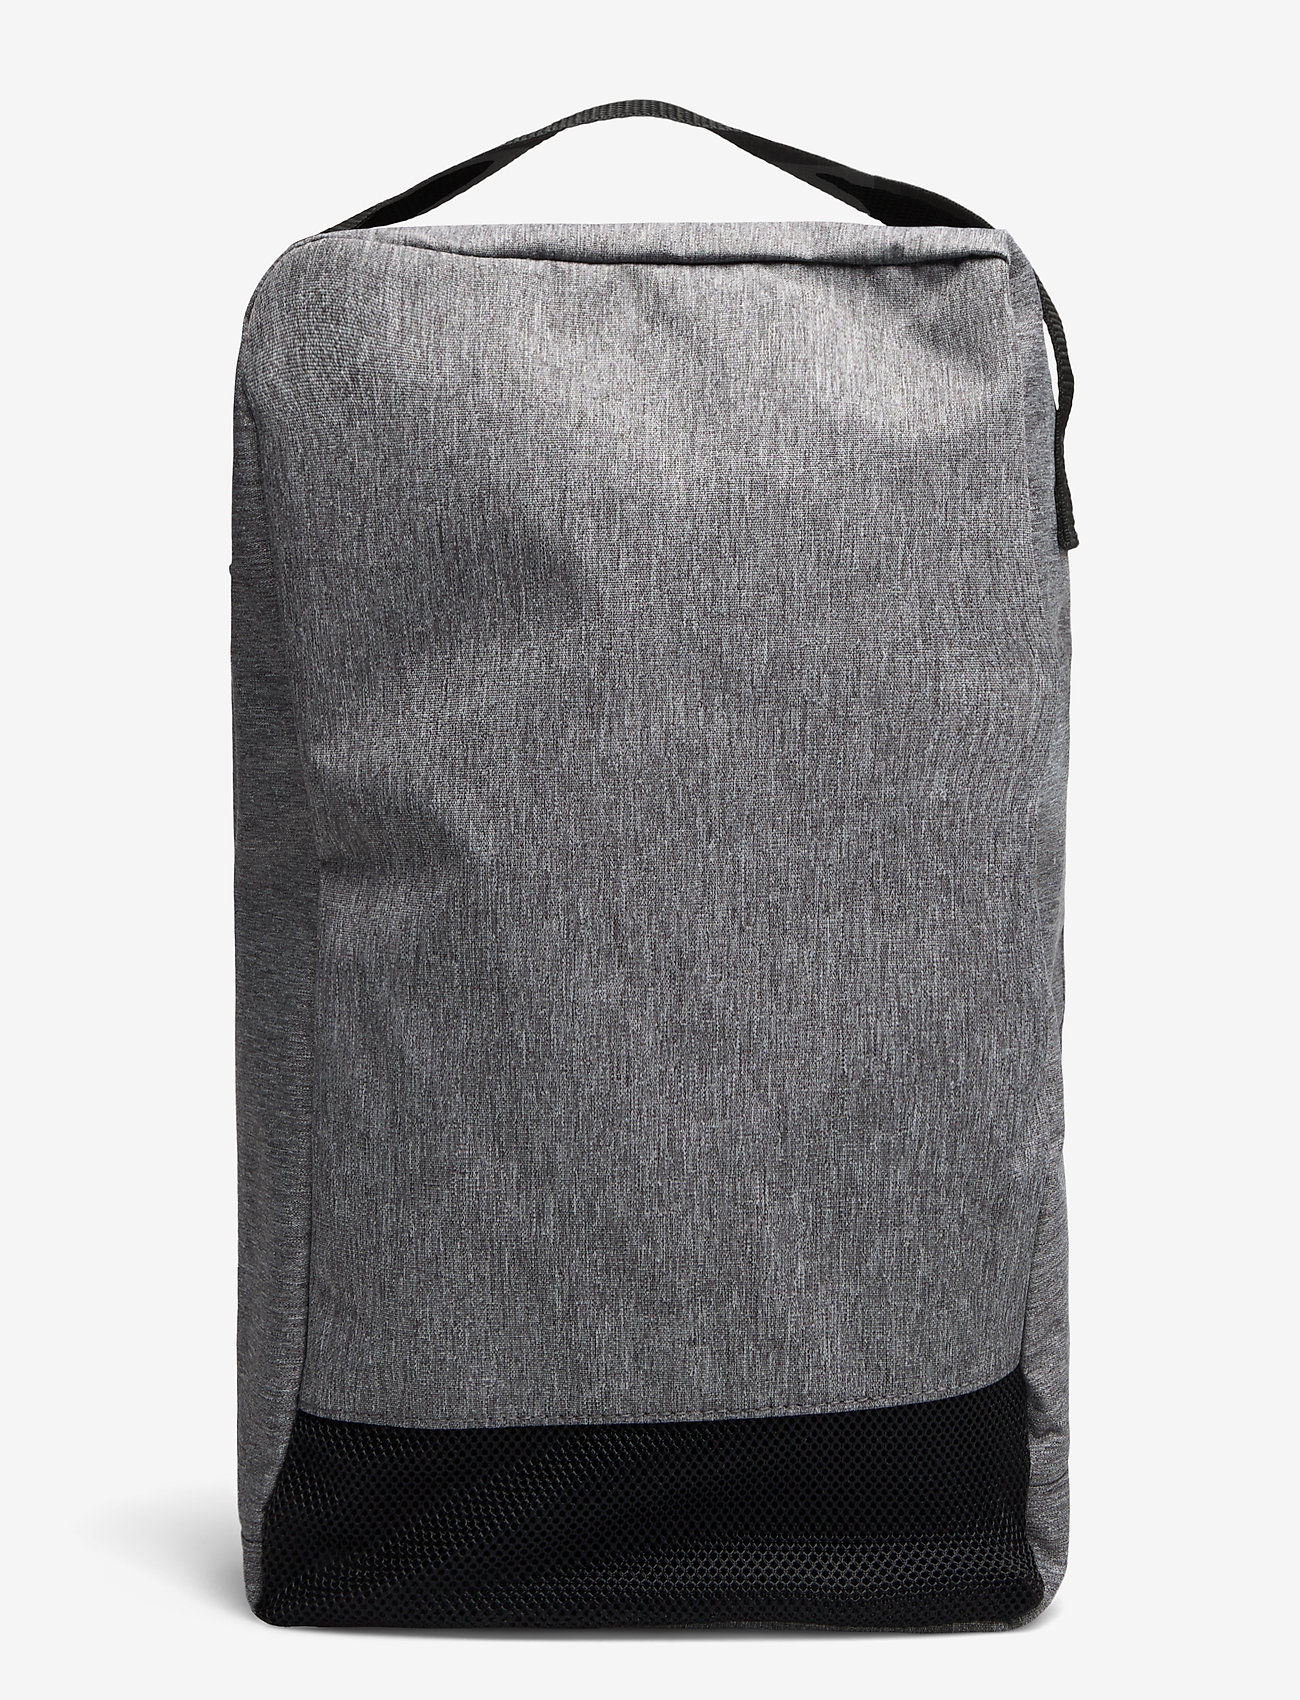 adidas Golf - GOLF SHOE BAG - golfvarusteet - grfime - 1